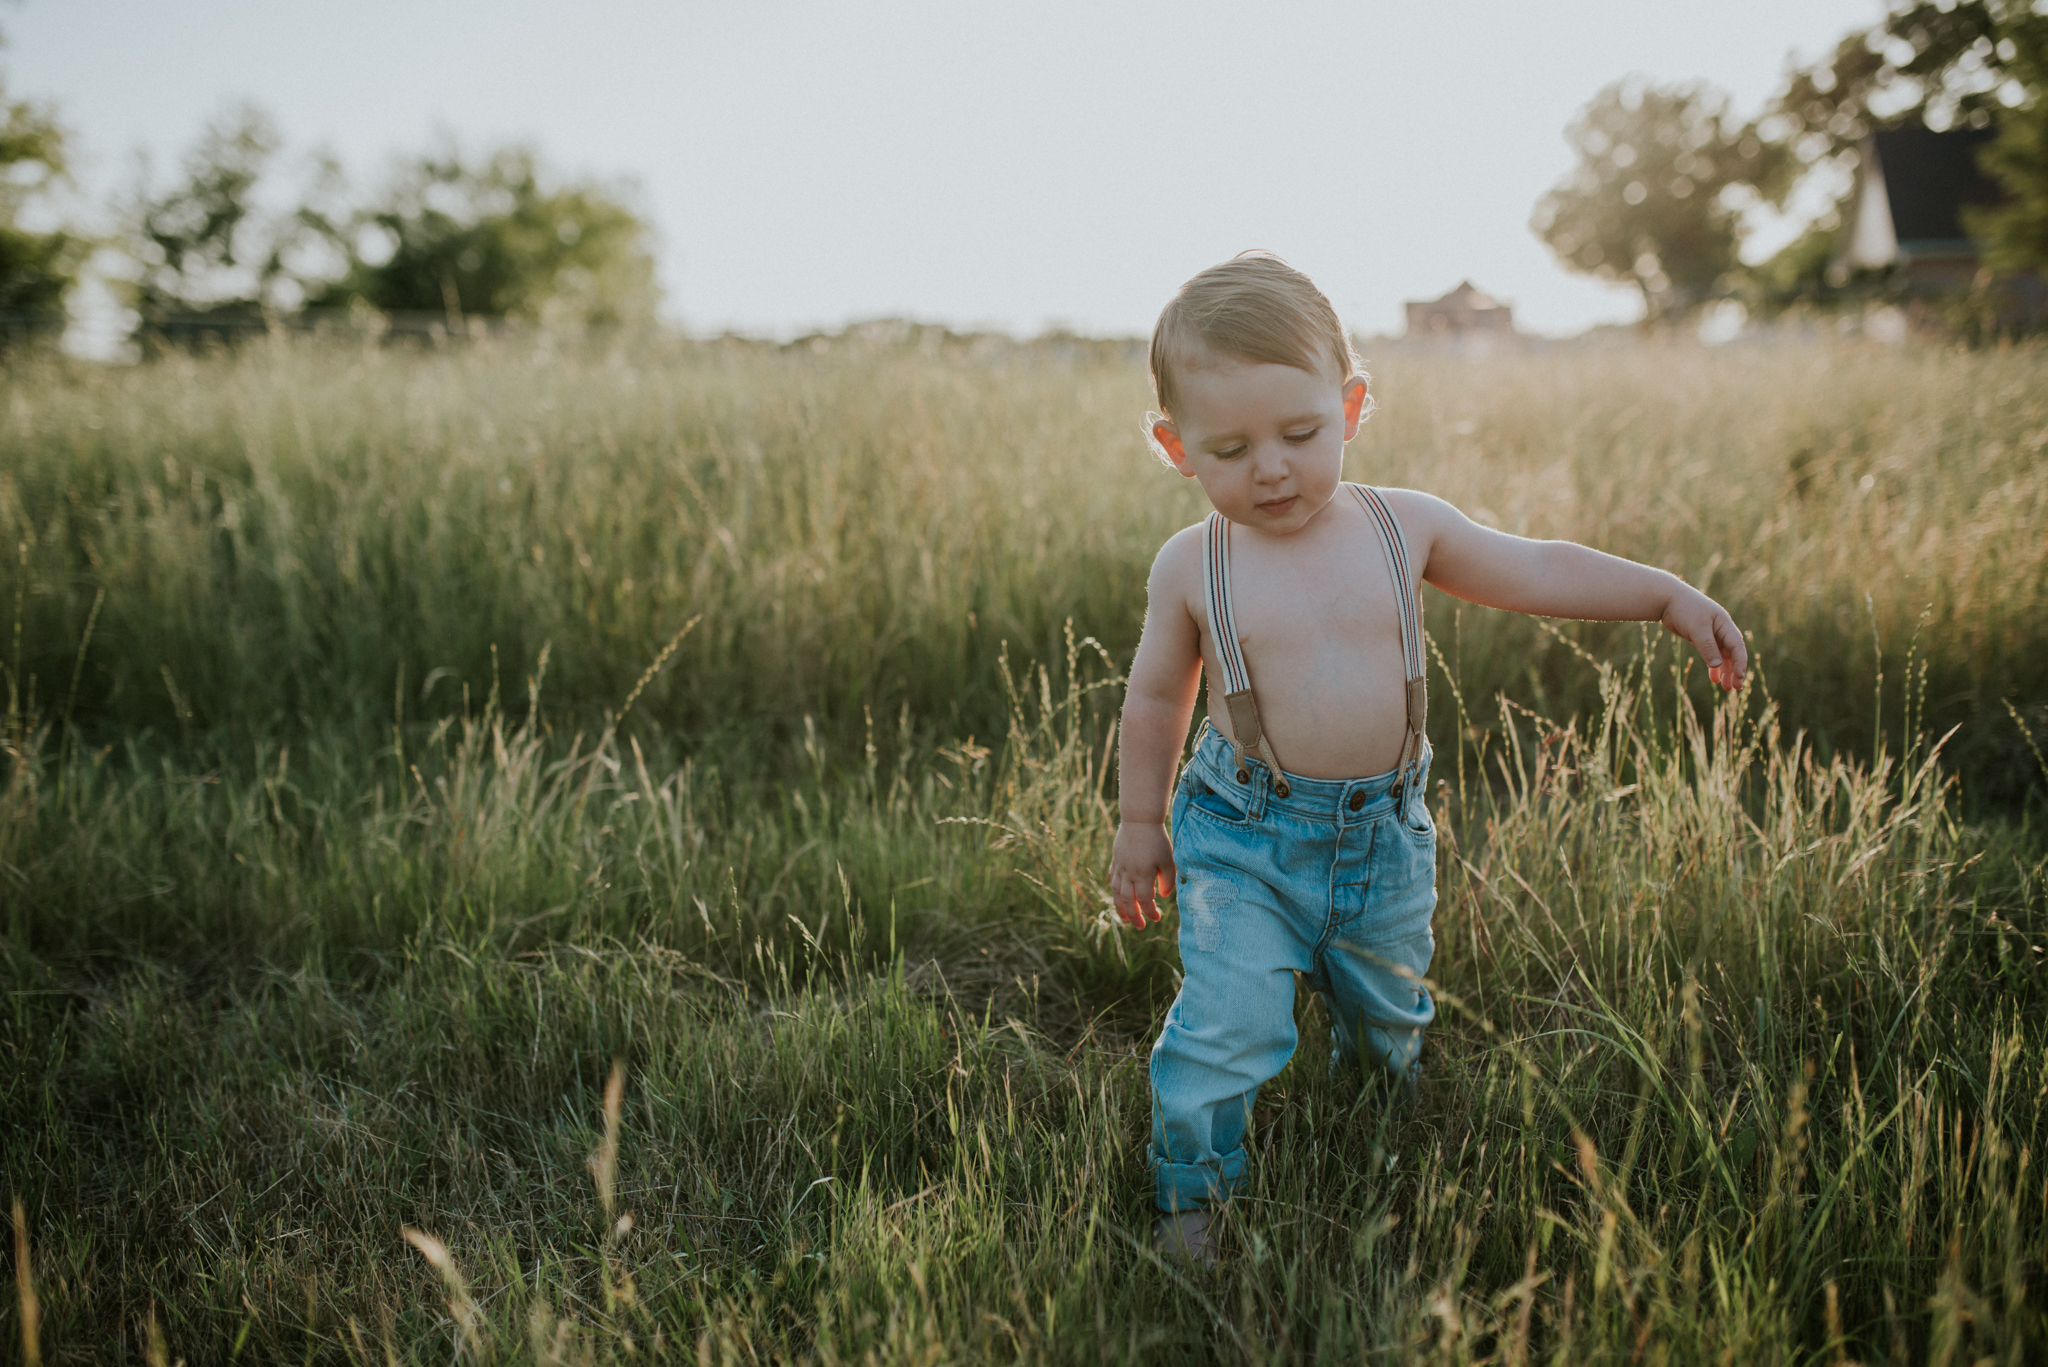 Graham-18 months-39.jpg